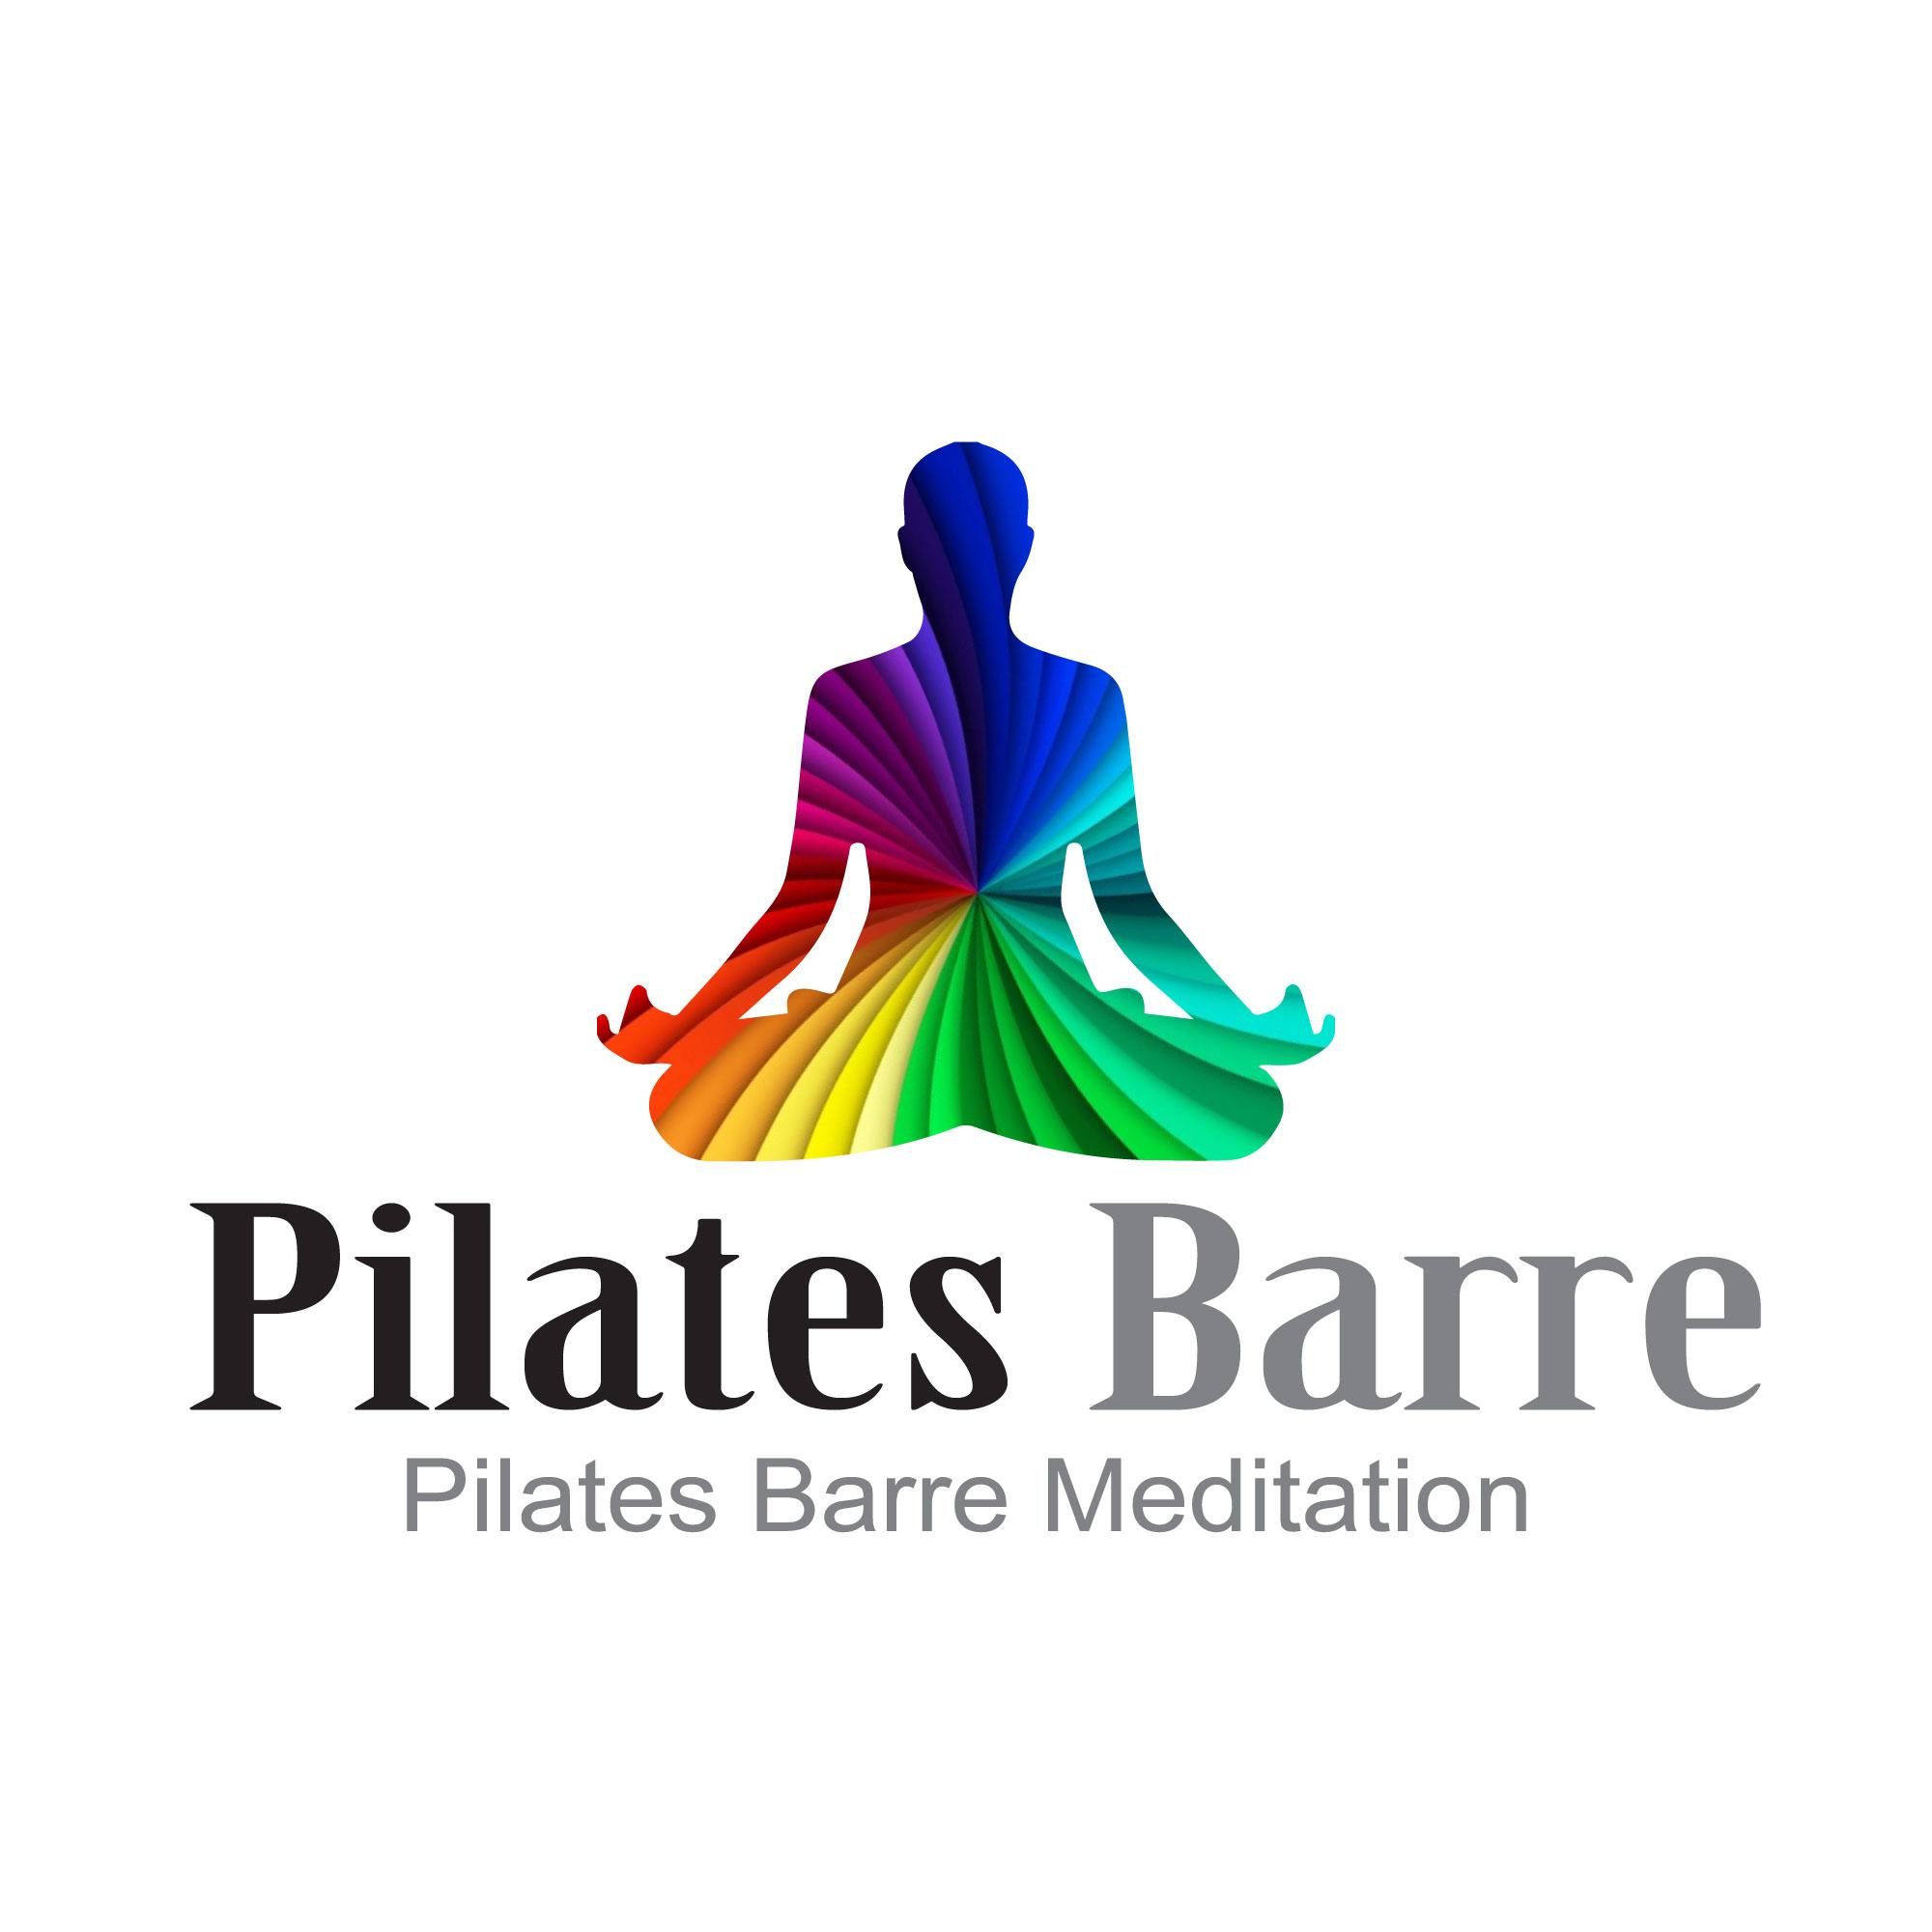 pilatesbarremeditation.jpg